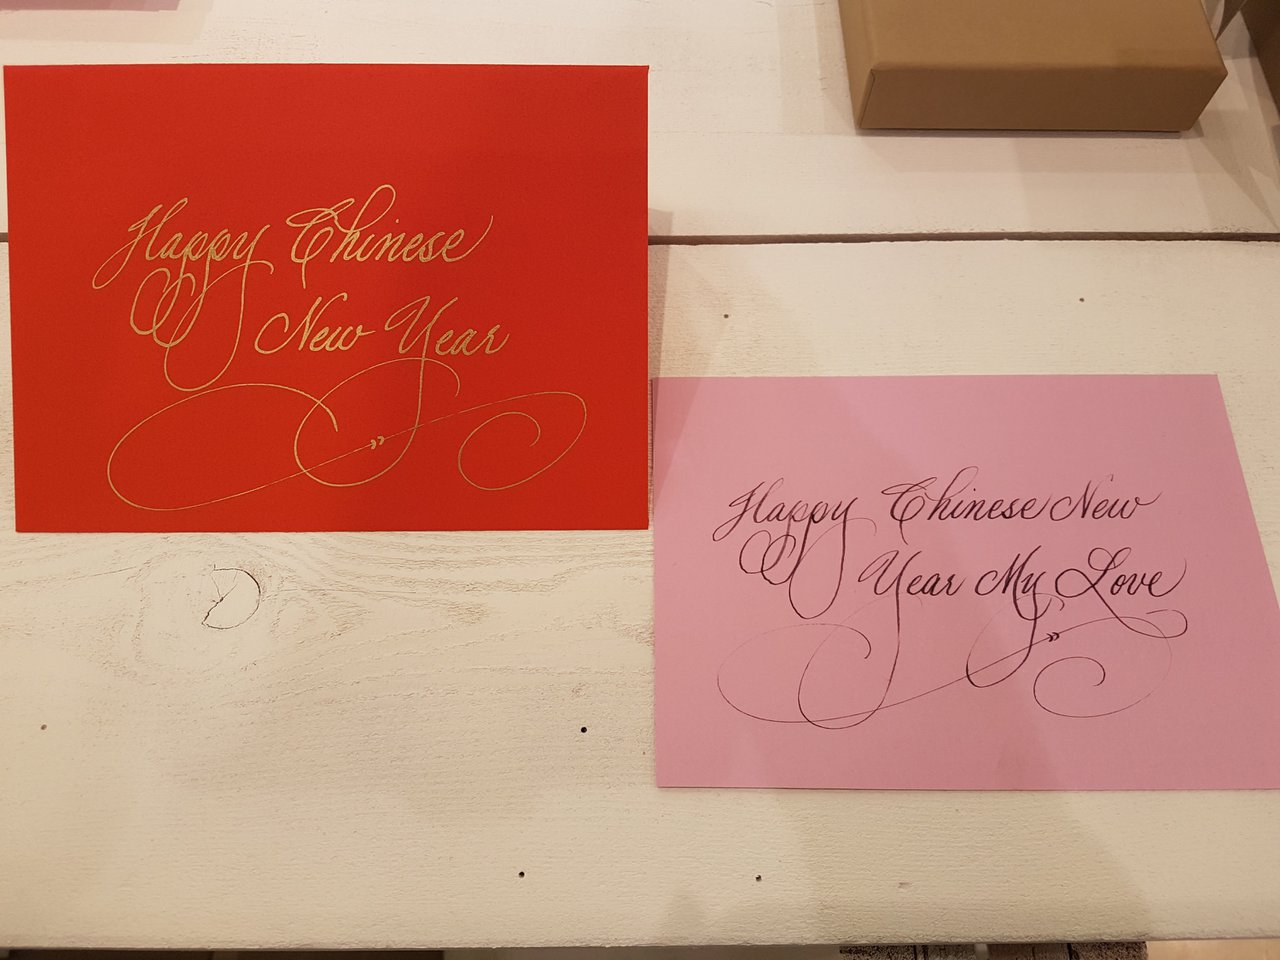 Burberry Personalization photo 20180211_133333.jpg